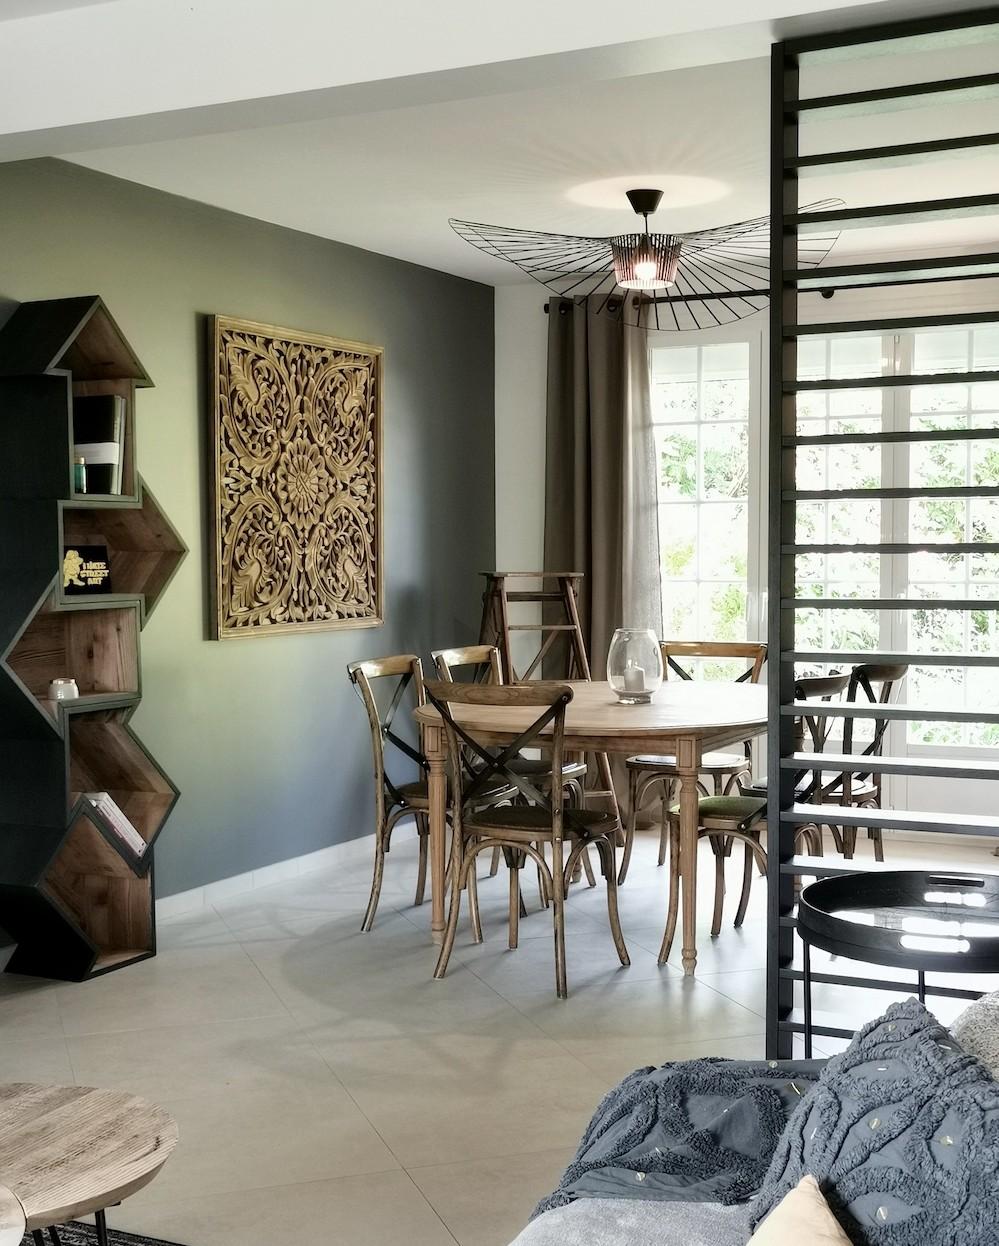 Renovation-maison-salon-serris-77-large-2